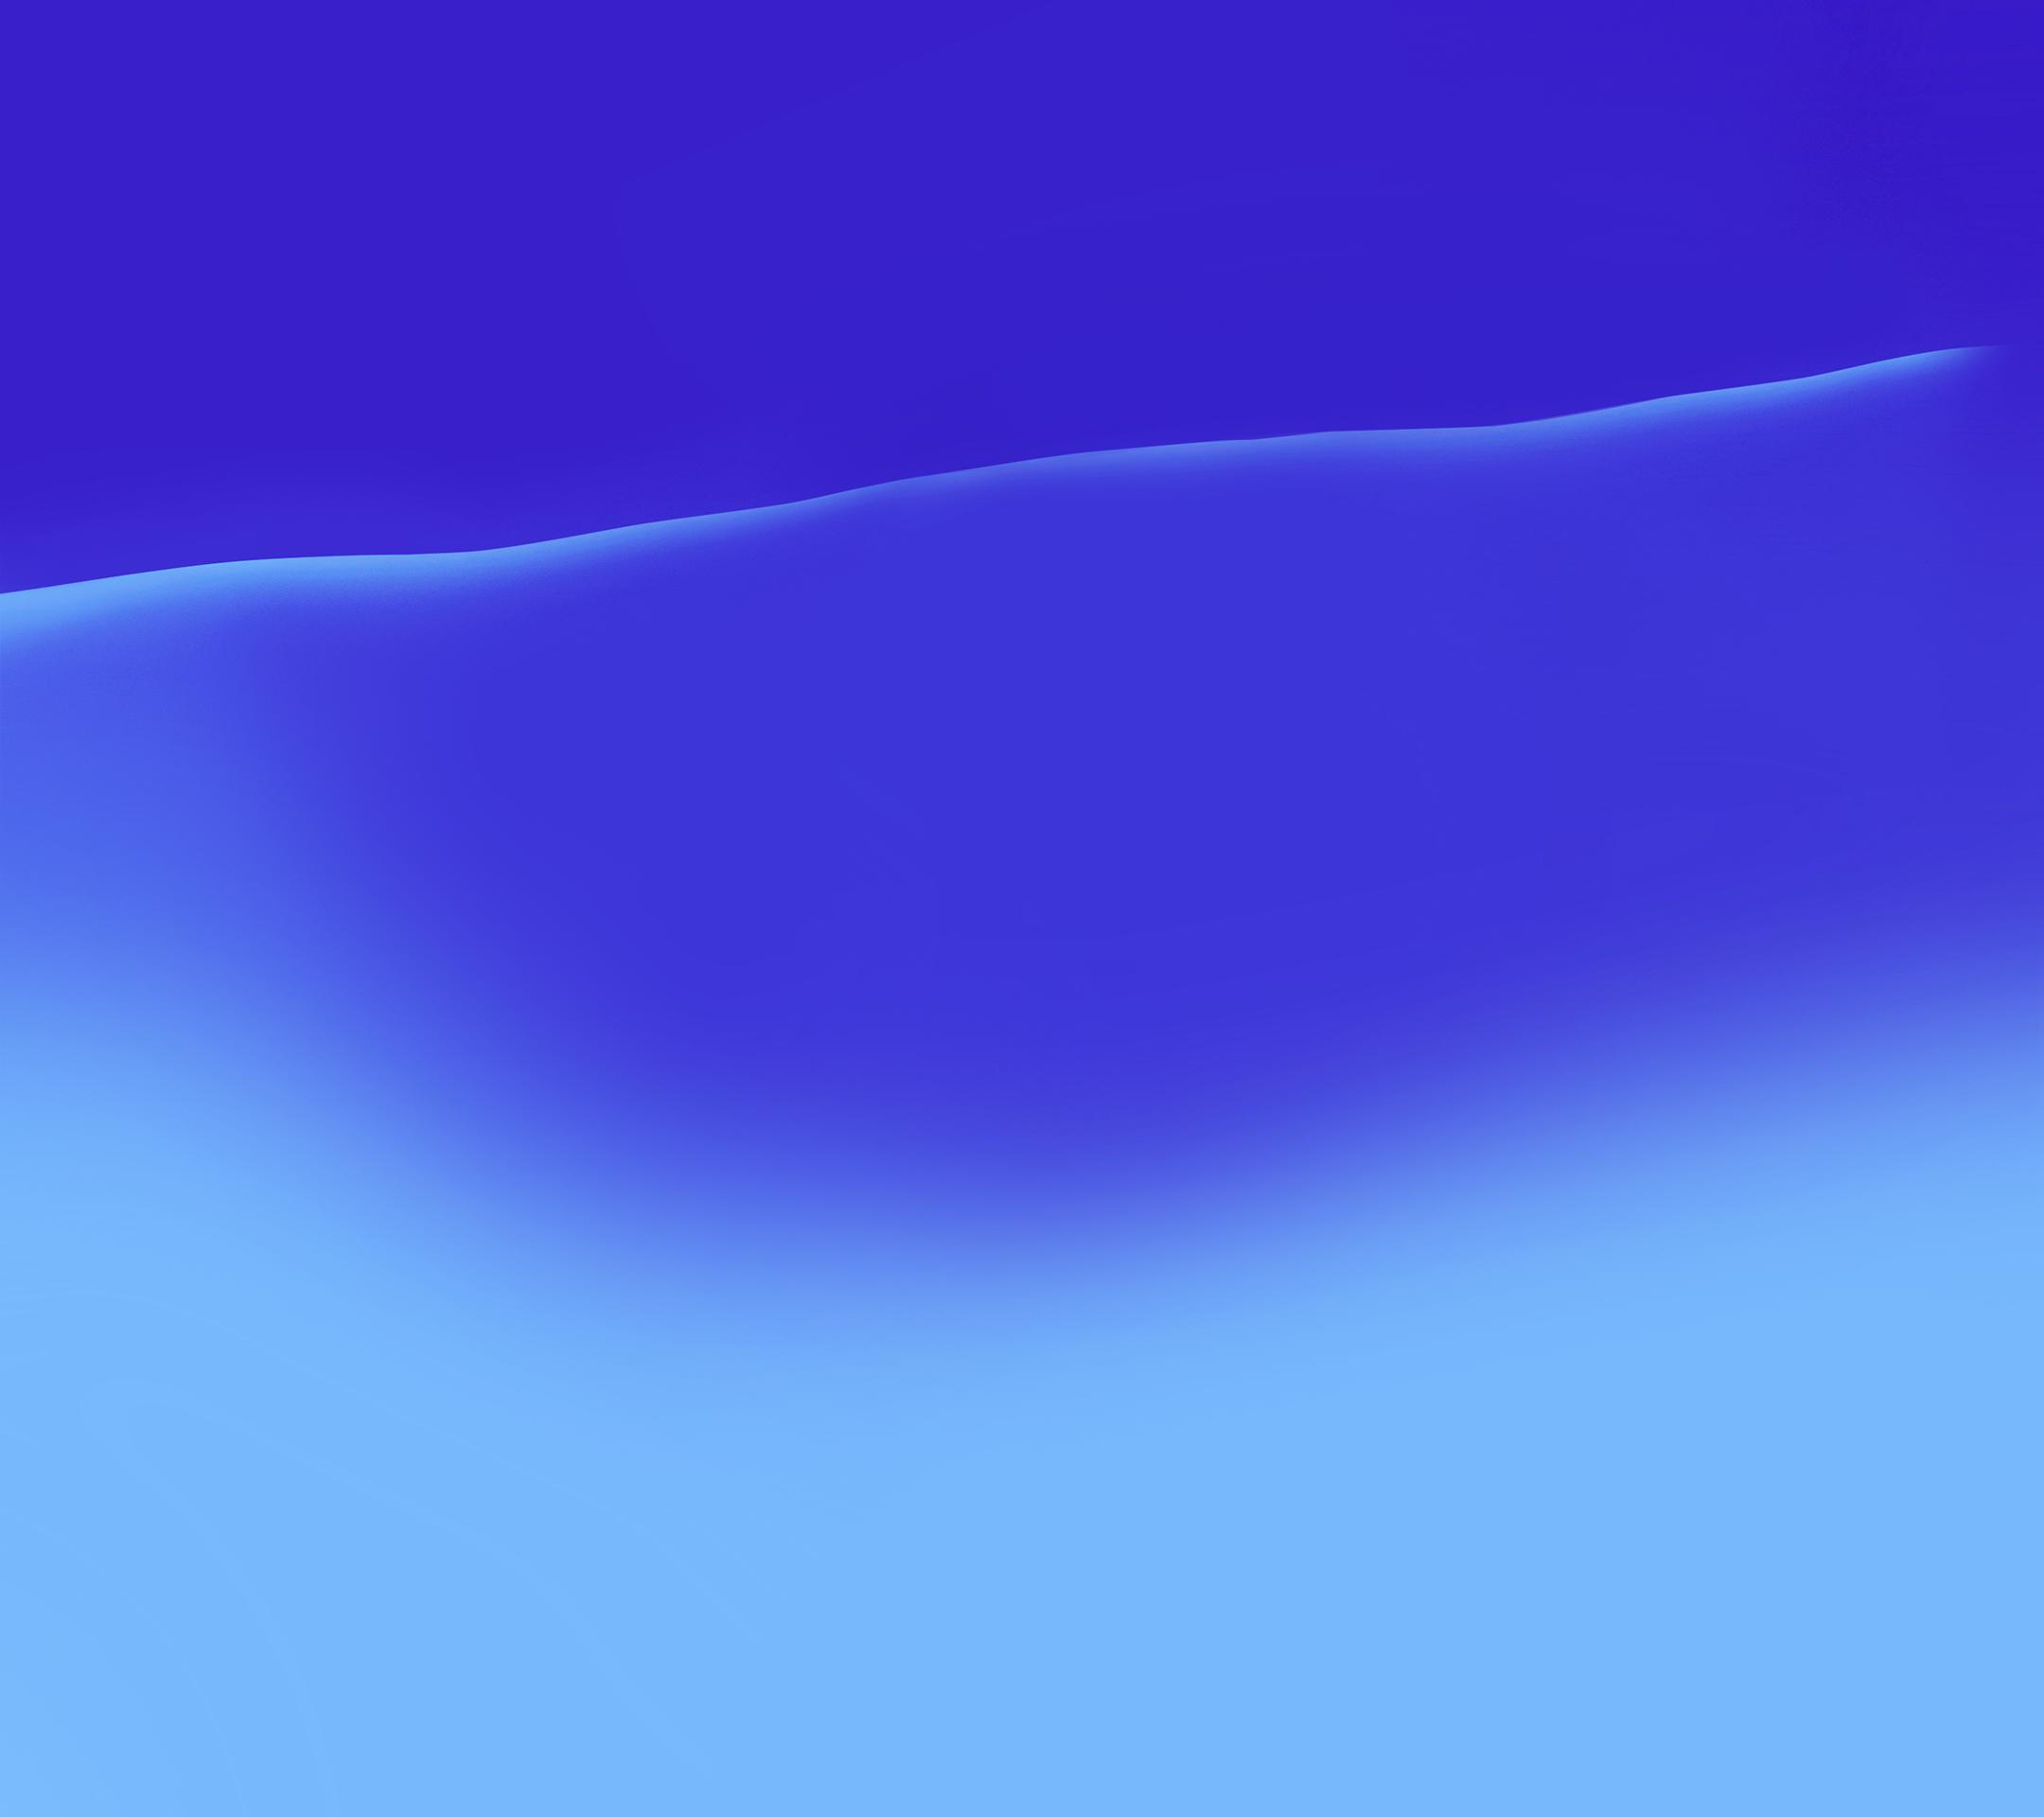 Android-O-Wallpaper-1